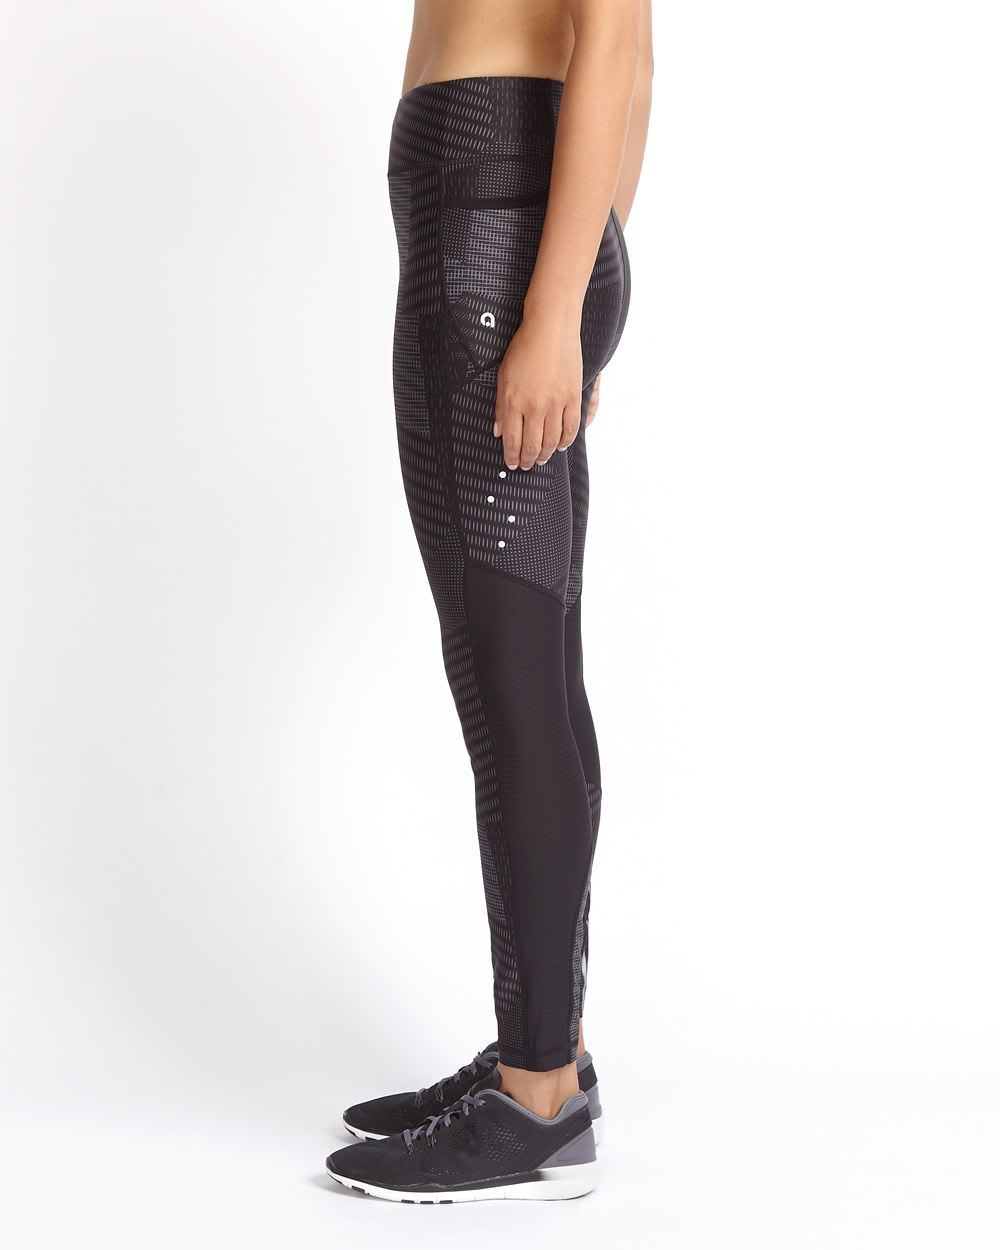 Hyba Printed Mesh Legging